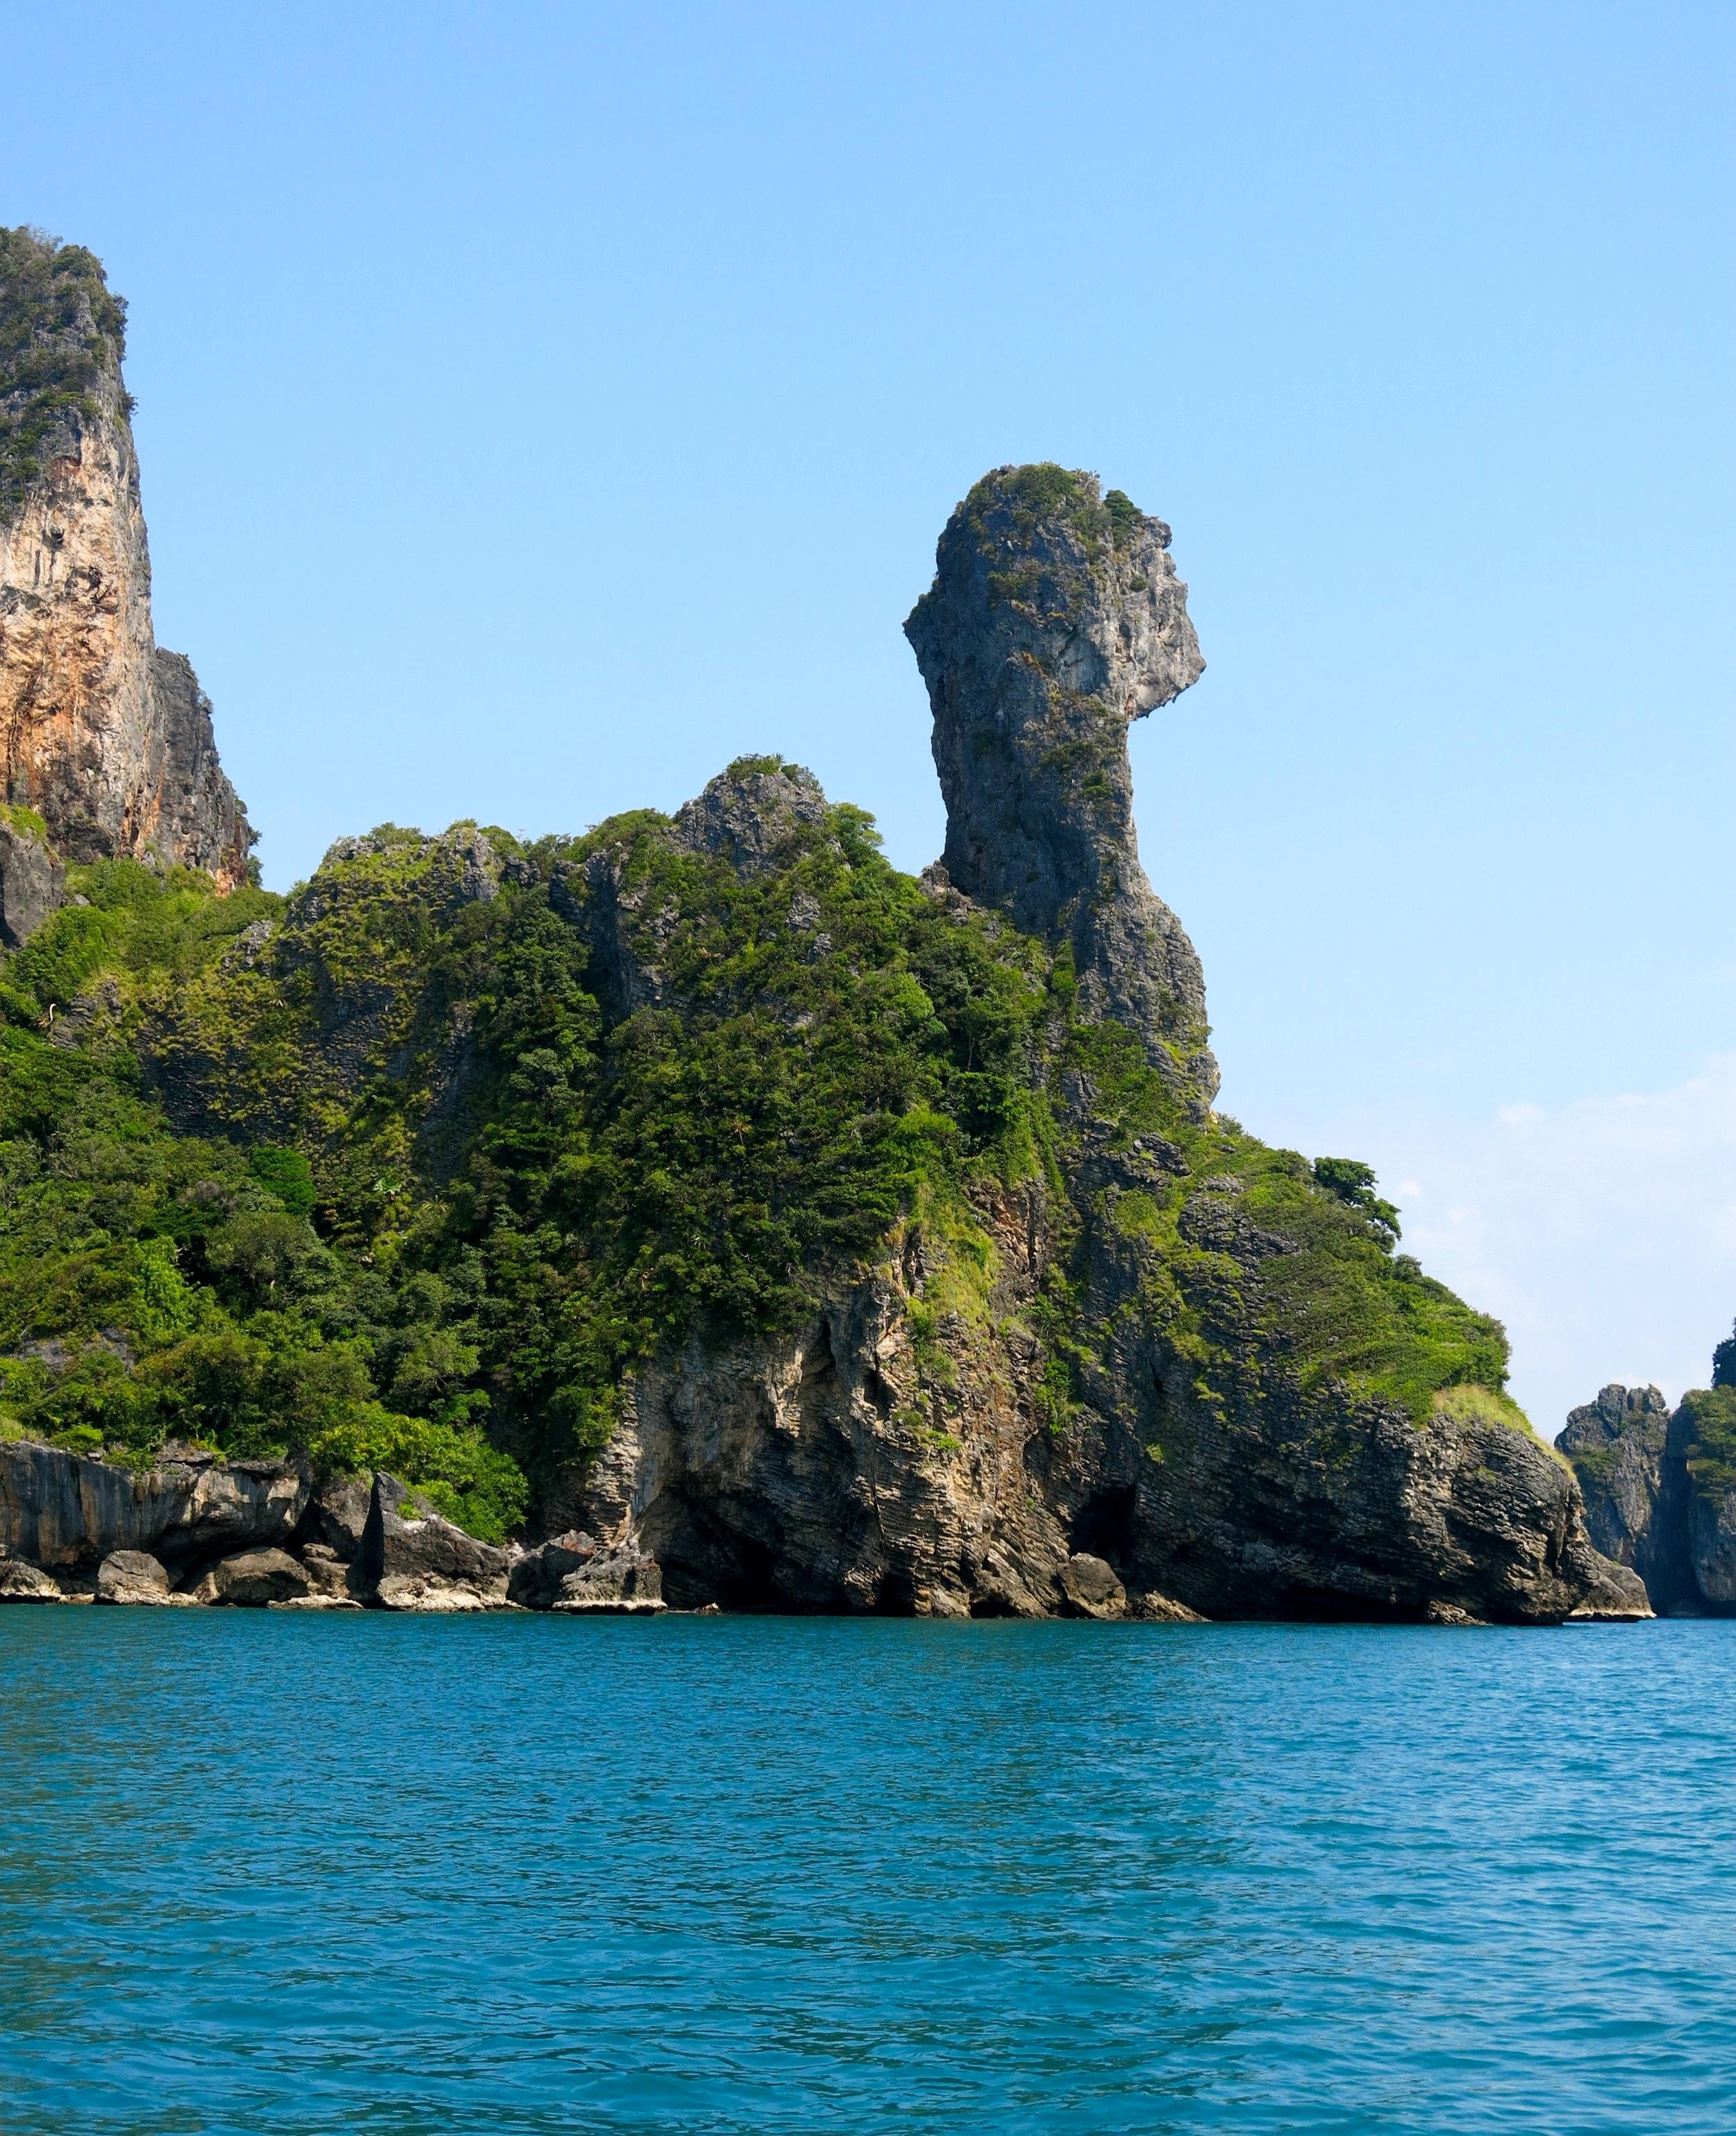 Chicken island is right next to Koh Poda island